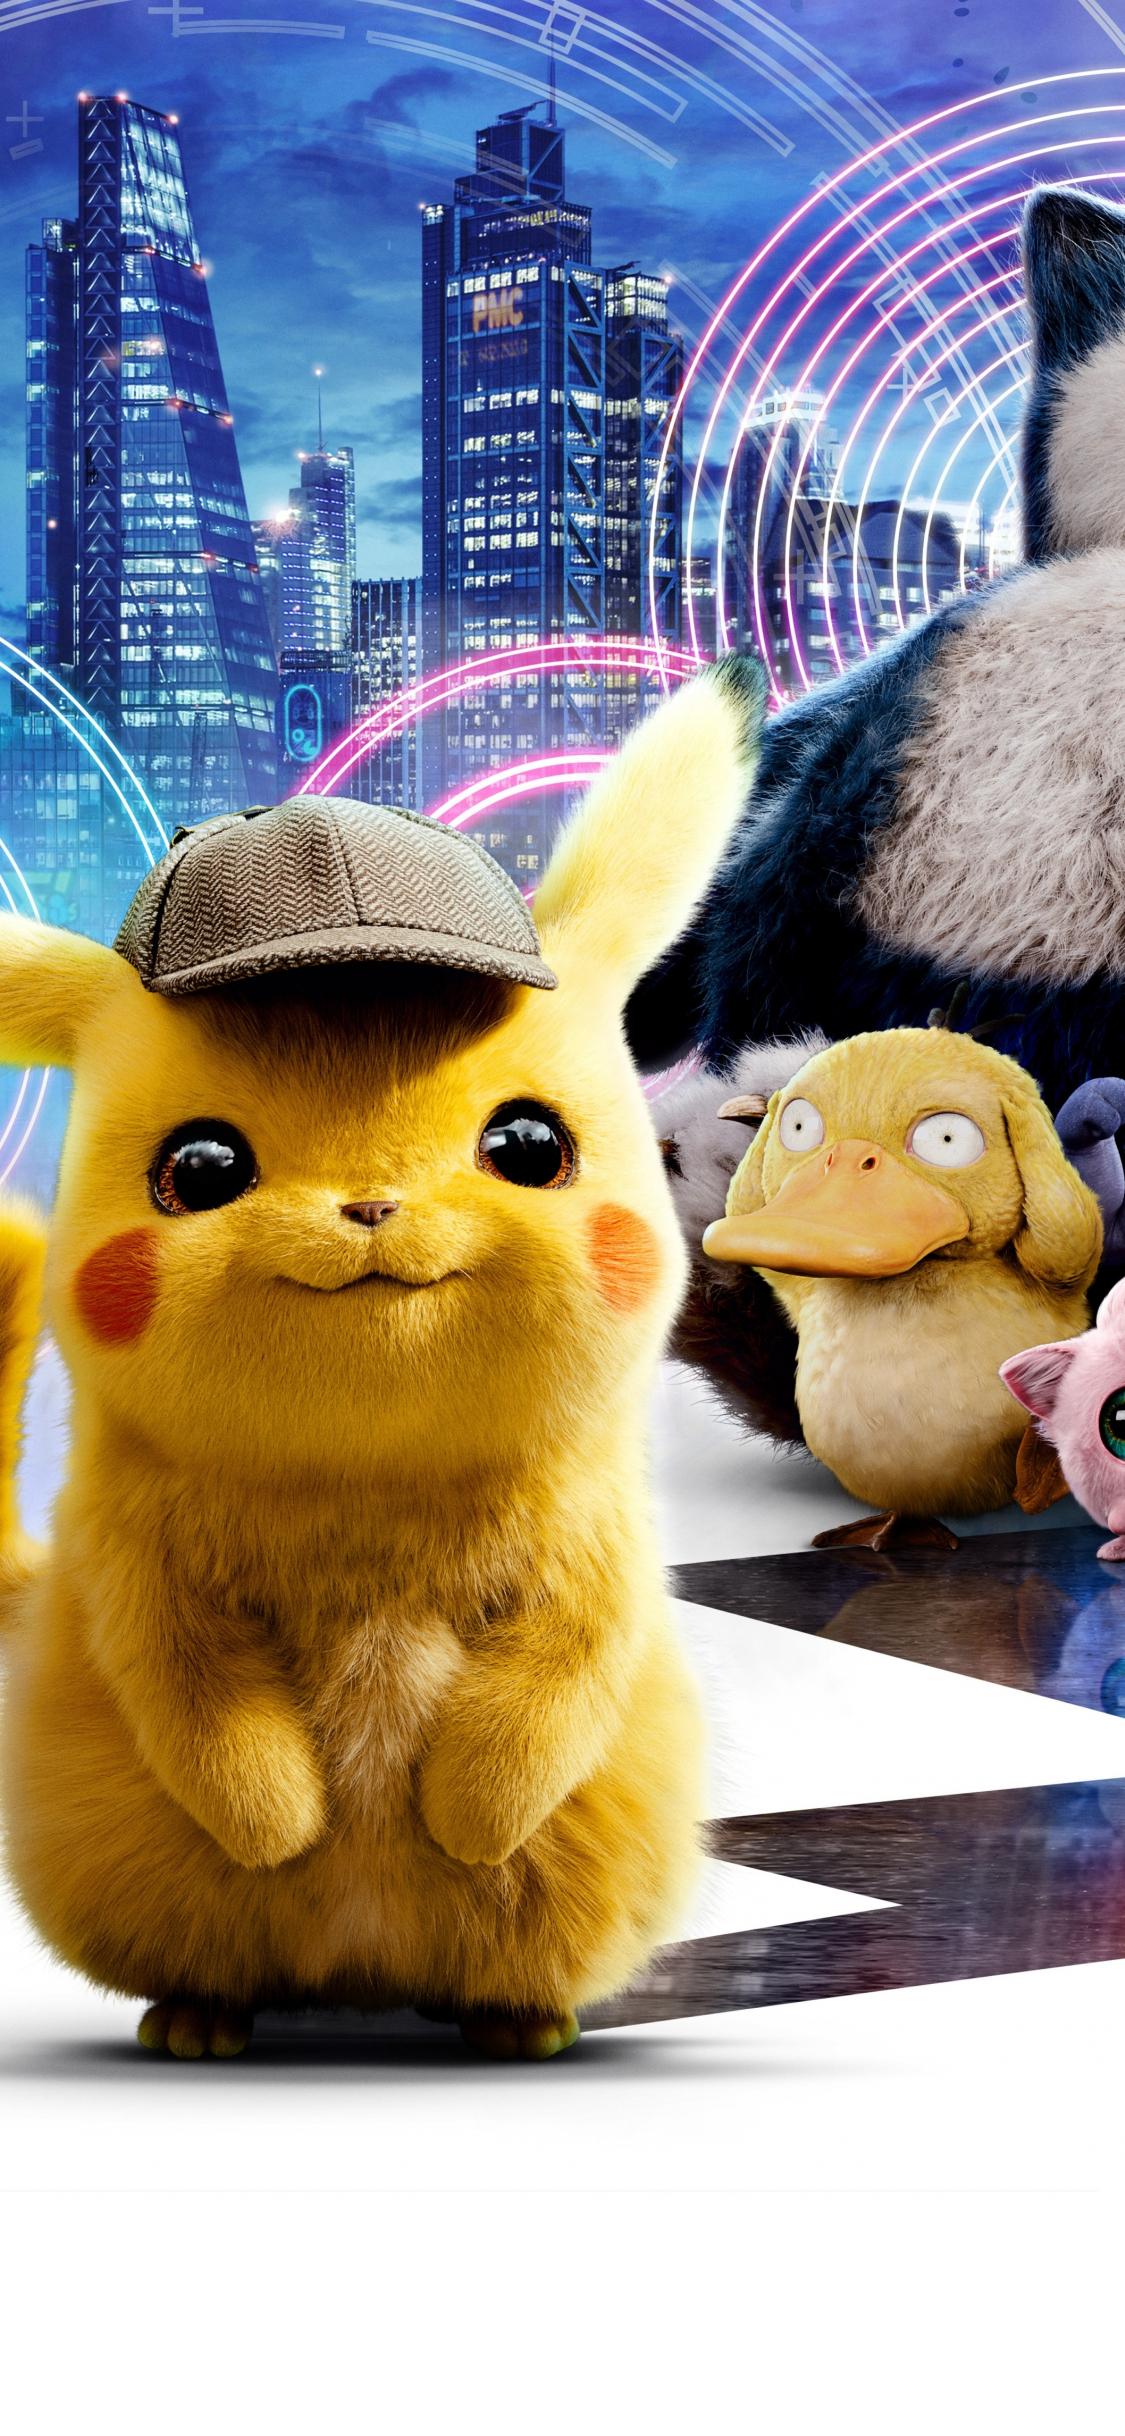 Download 1125x2436 Wallpaper Movie 2019 Pokémon Detective